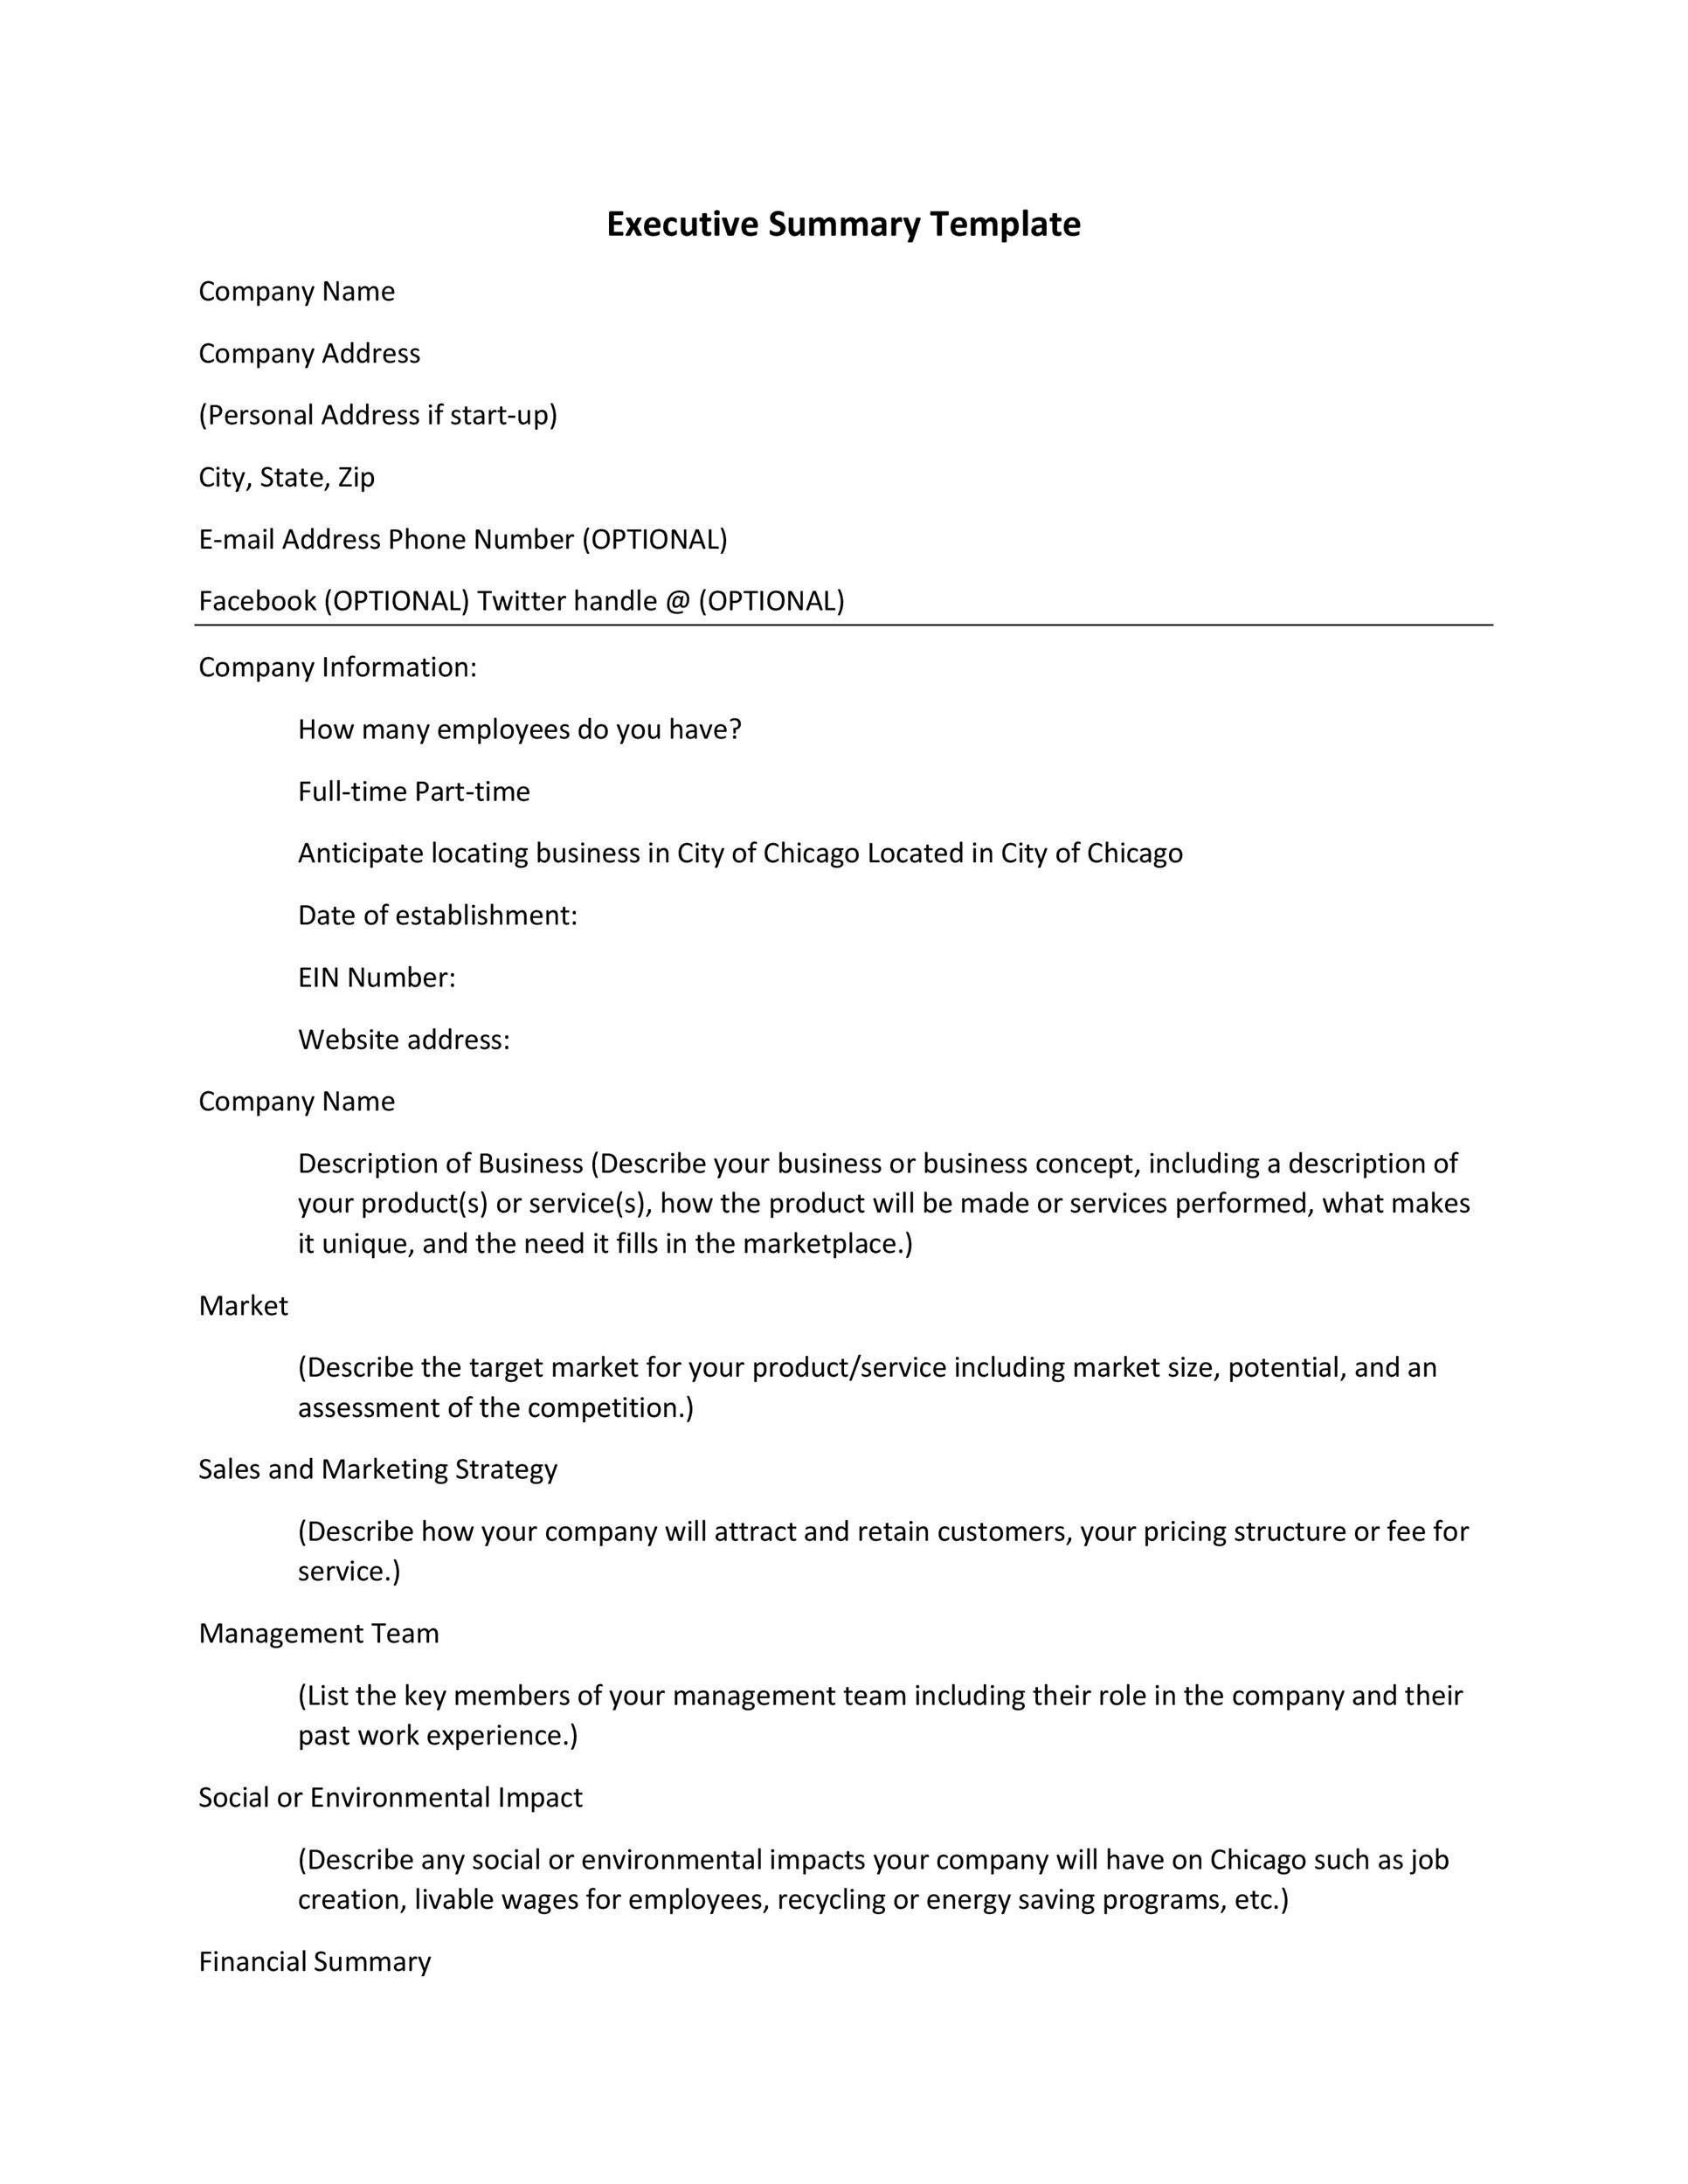 008 Phenomenal Executive Summary Template For Proposal. Photo  Sample Proposal Pdf ProjectFull